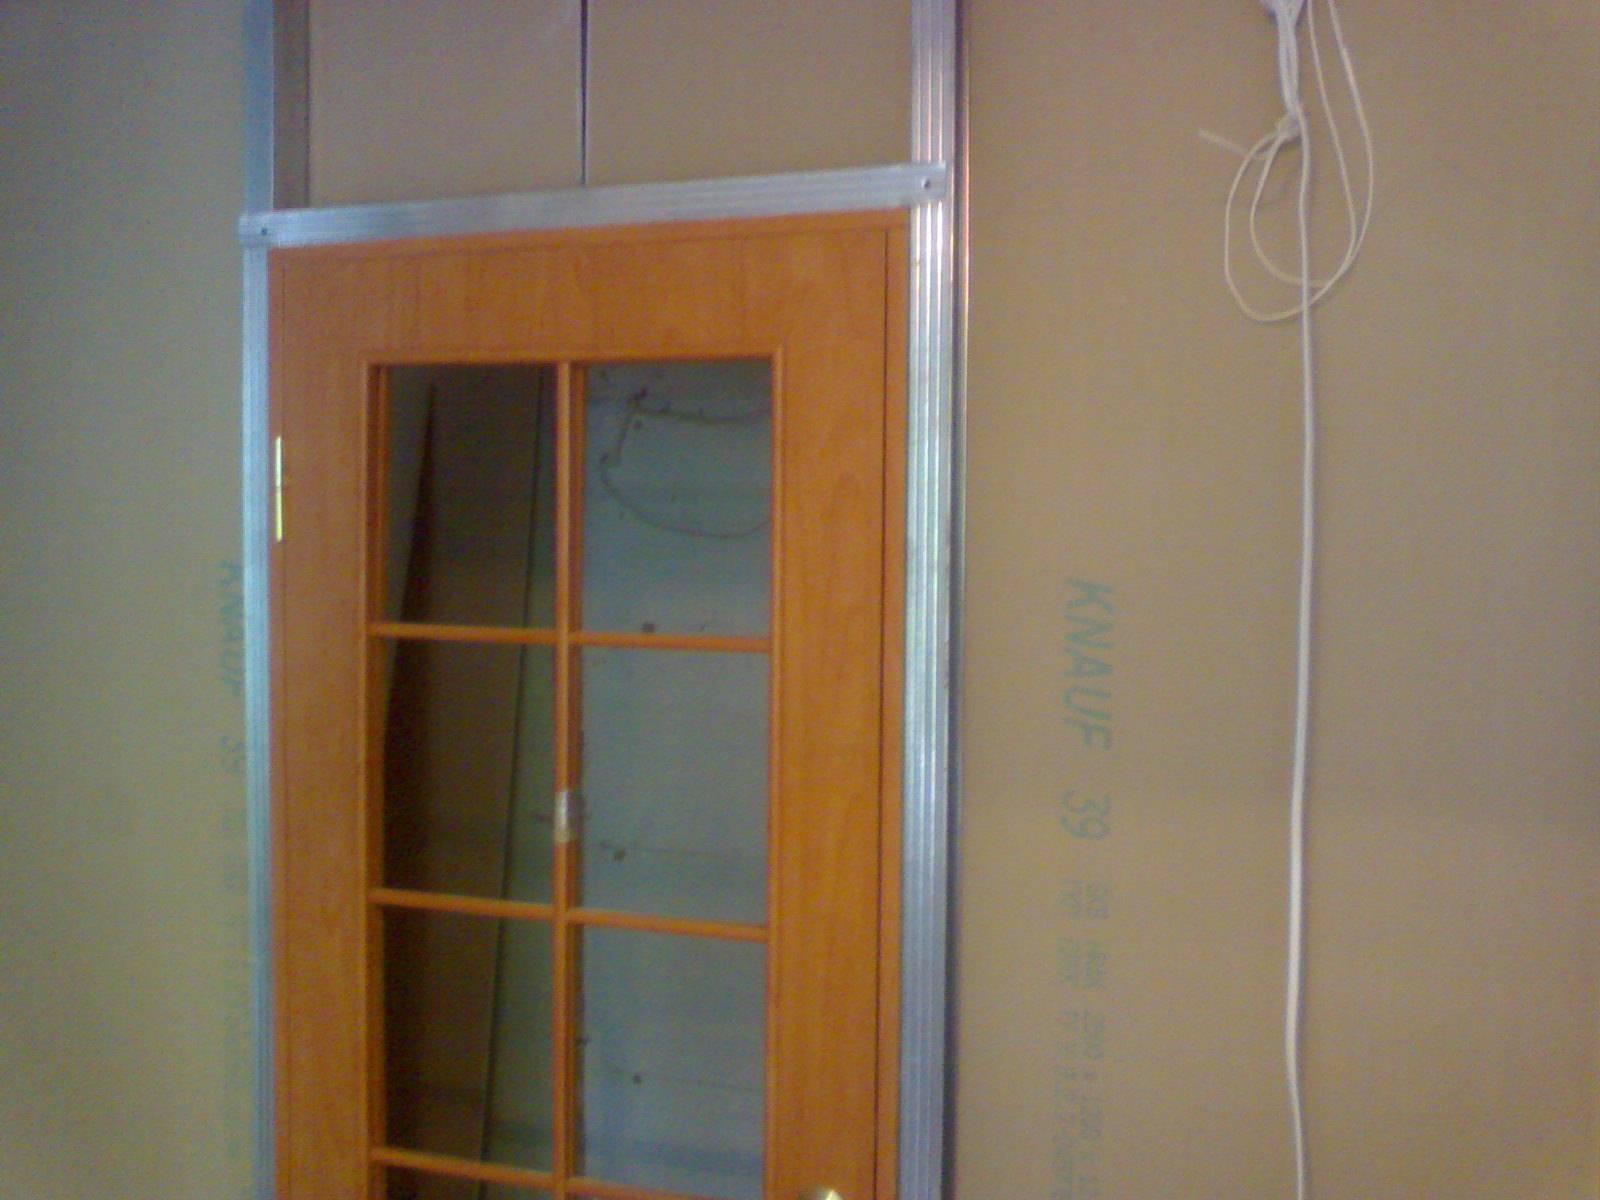 Установка дверной коробки межкомнатной двери, сборка своими руками